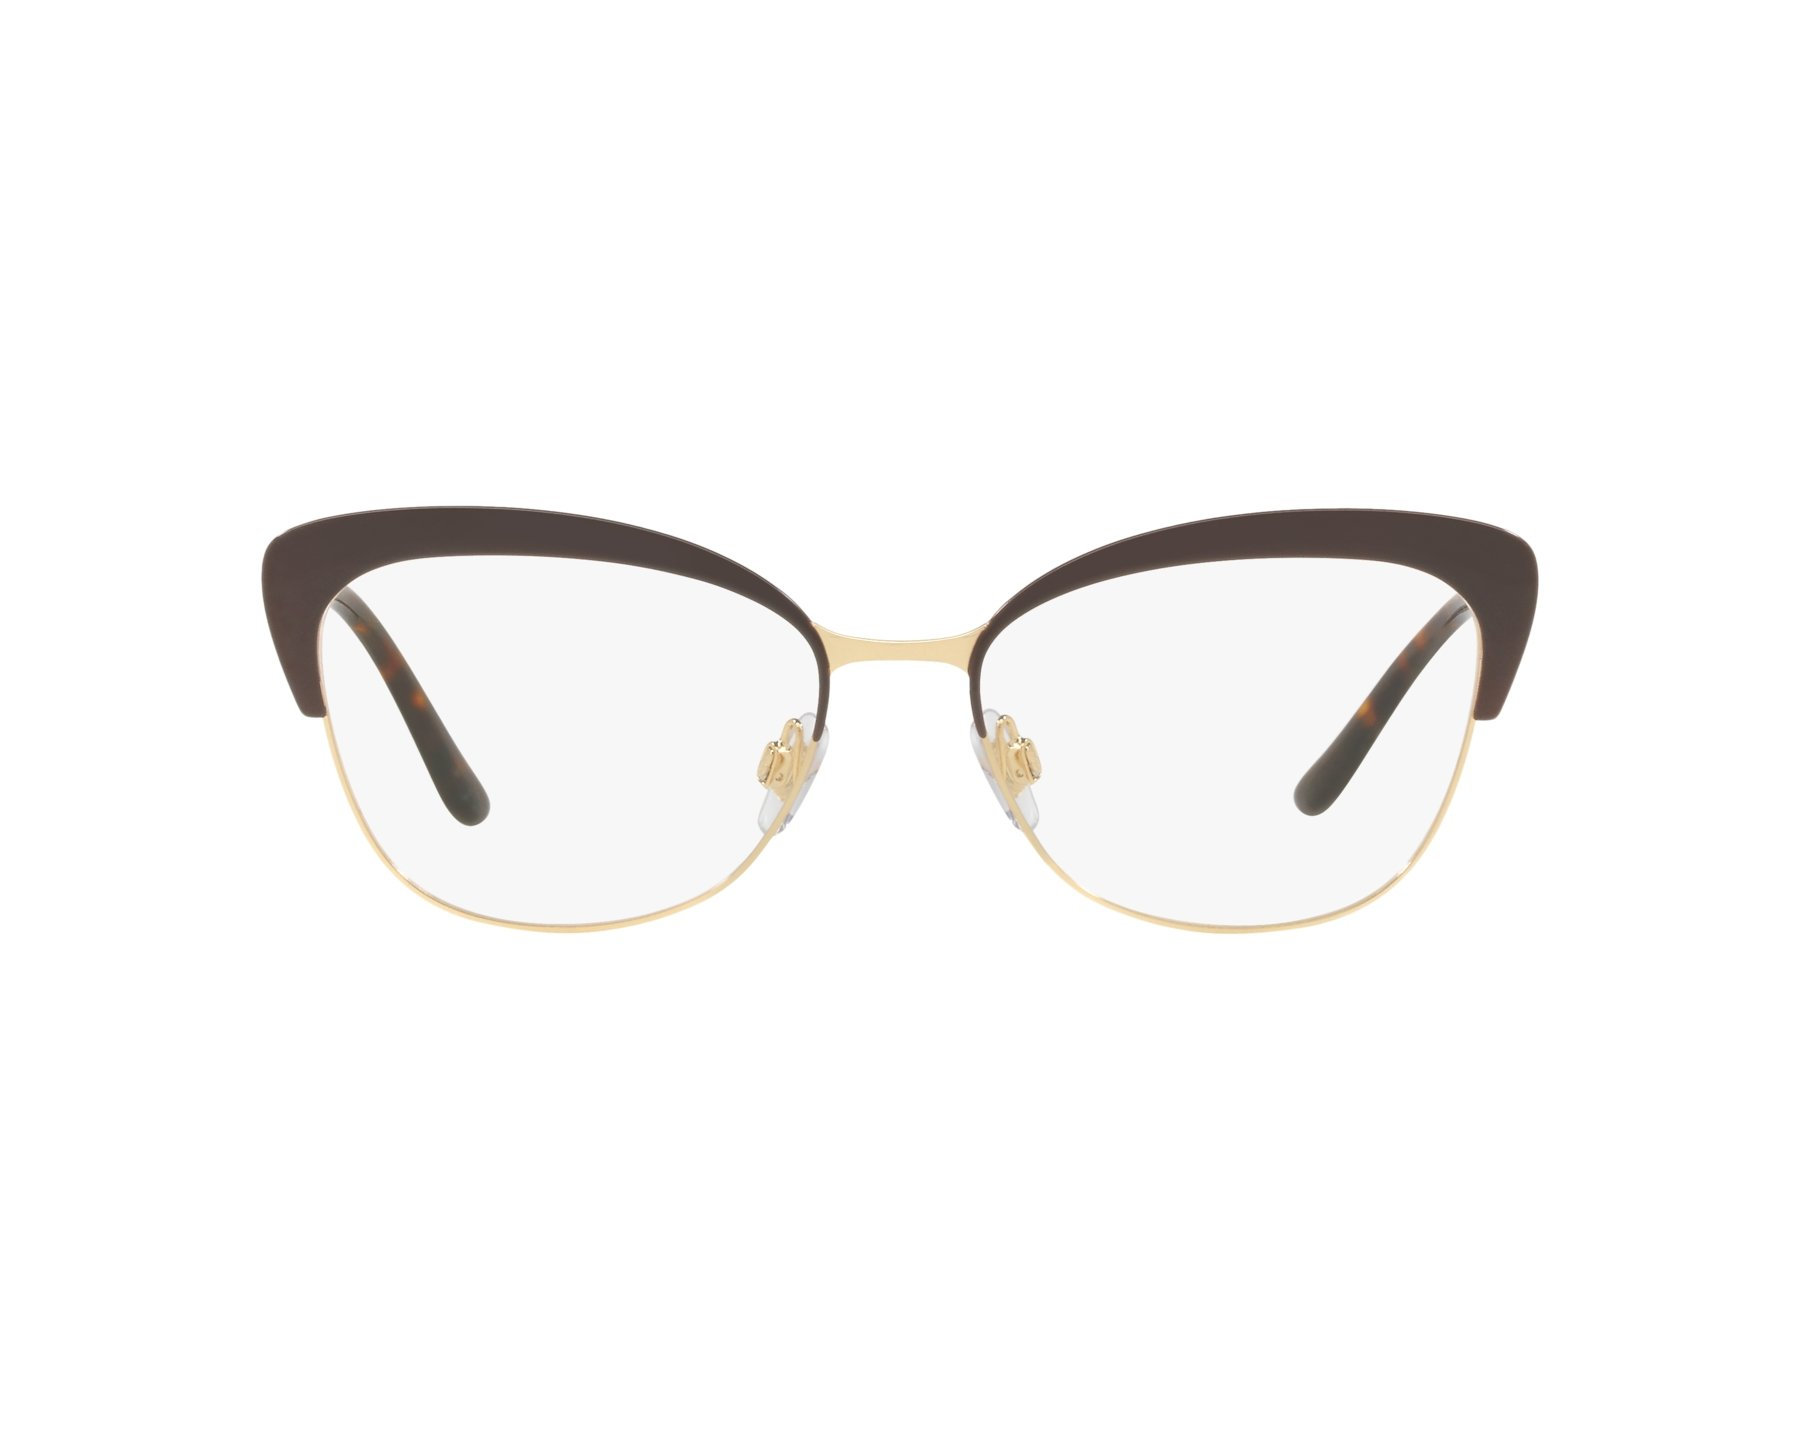 eyeglasses Dolce & Gabbana DG-1298 1315 54-16 Brown Gold 360 degree view